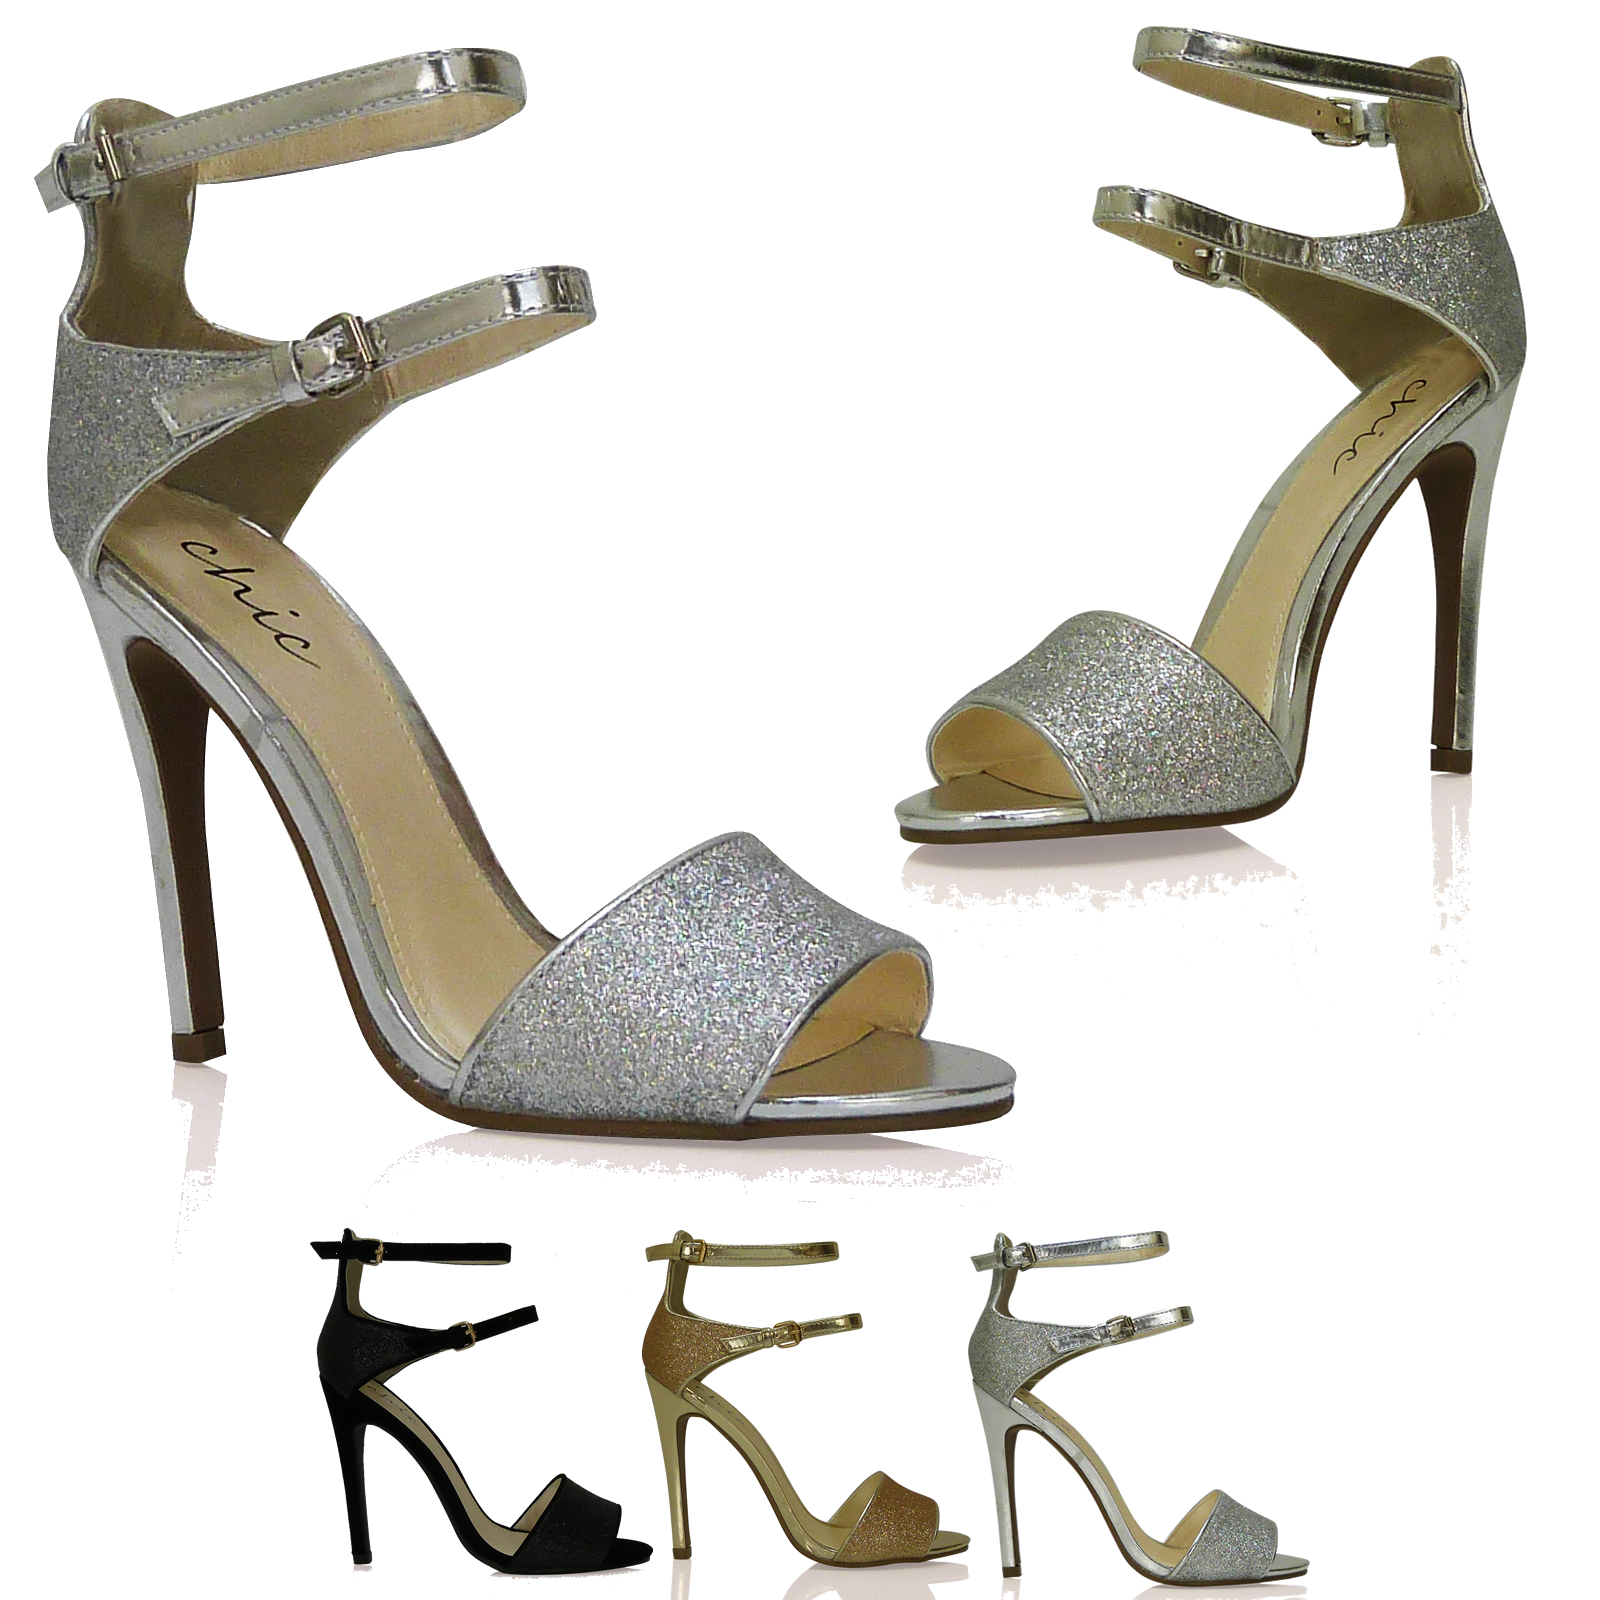 pumps sandalen high heels riemchen zehenfrei schwarz gold silber eu 36 41 ebay. Black Bedroom Furniture Sets. Home Design Ideas